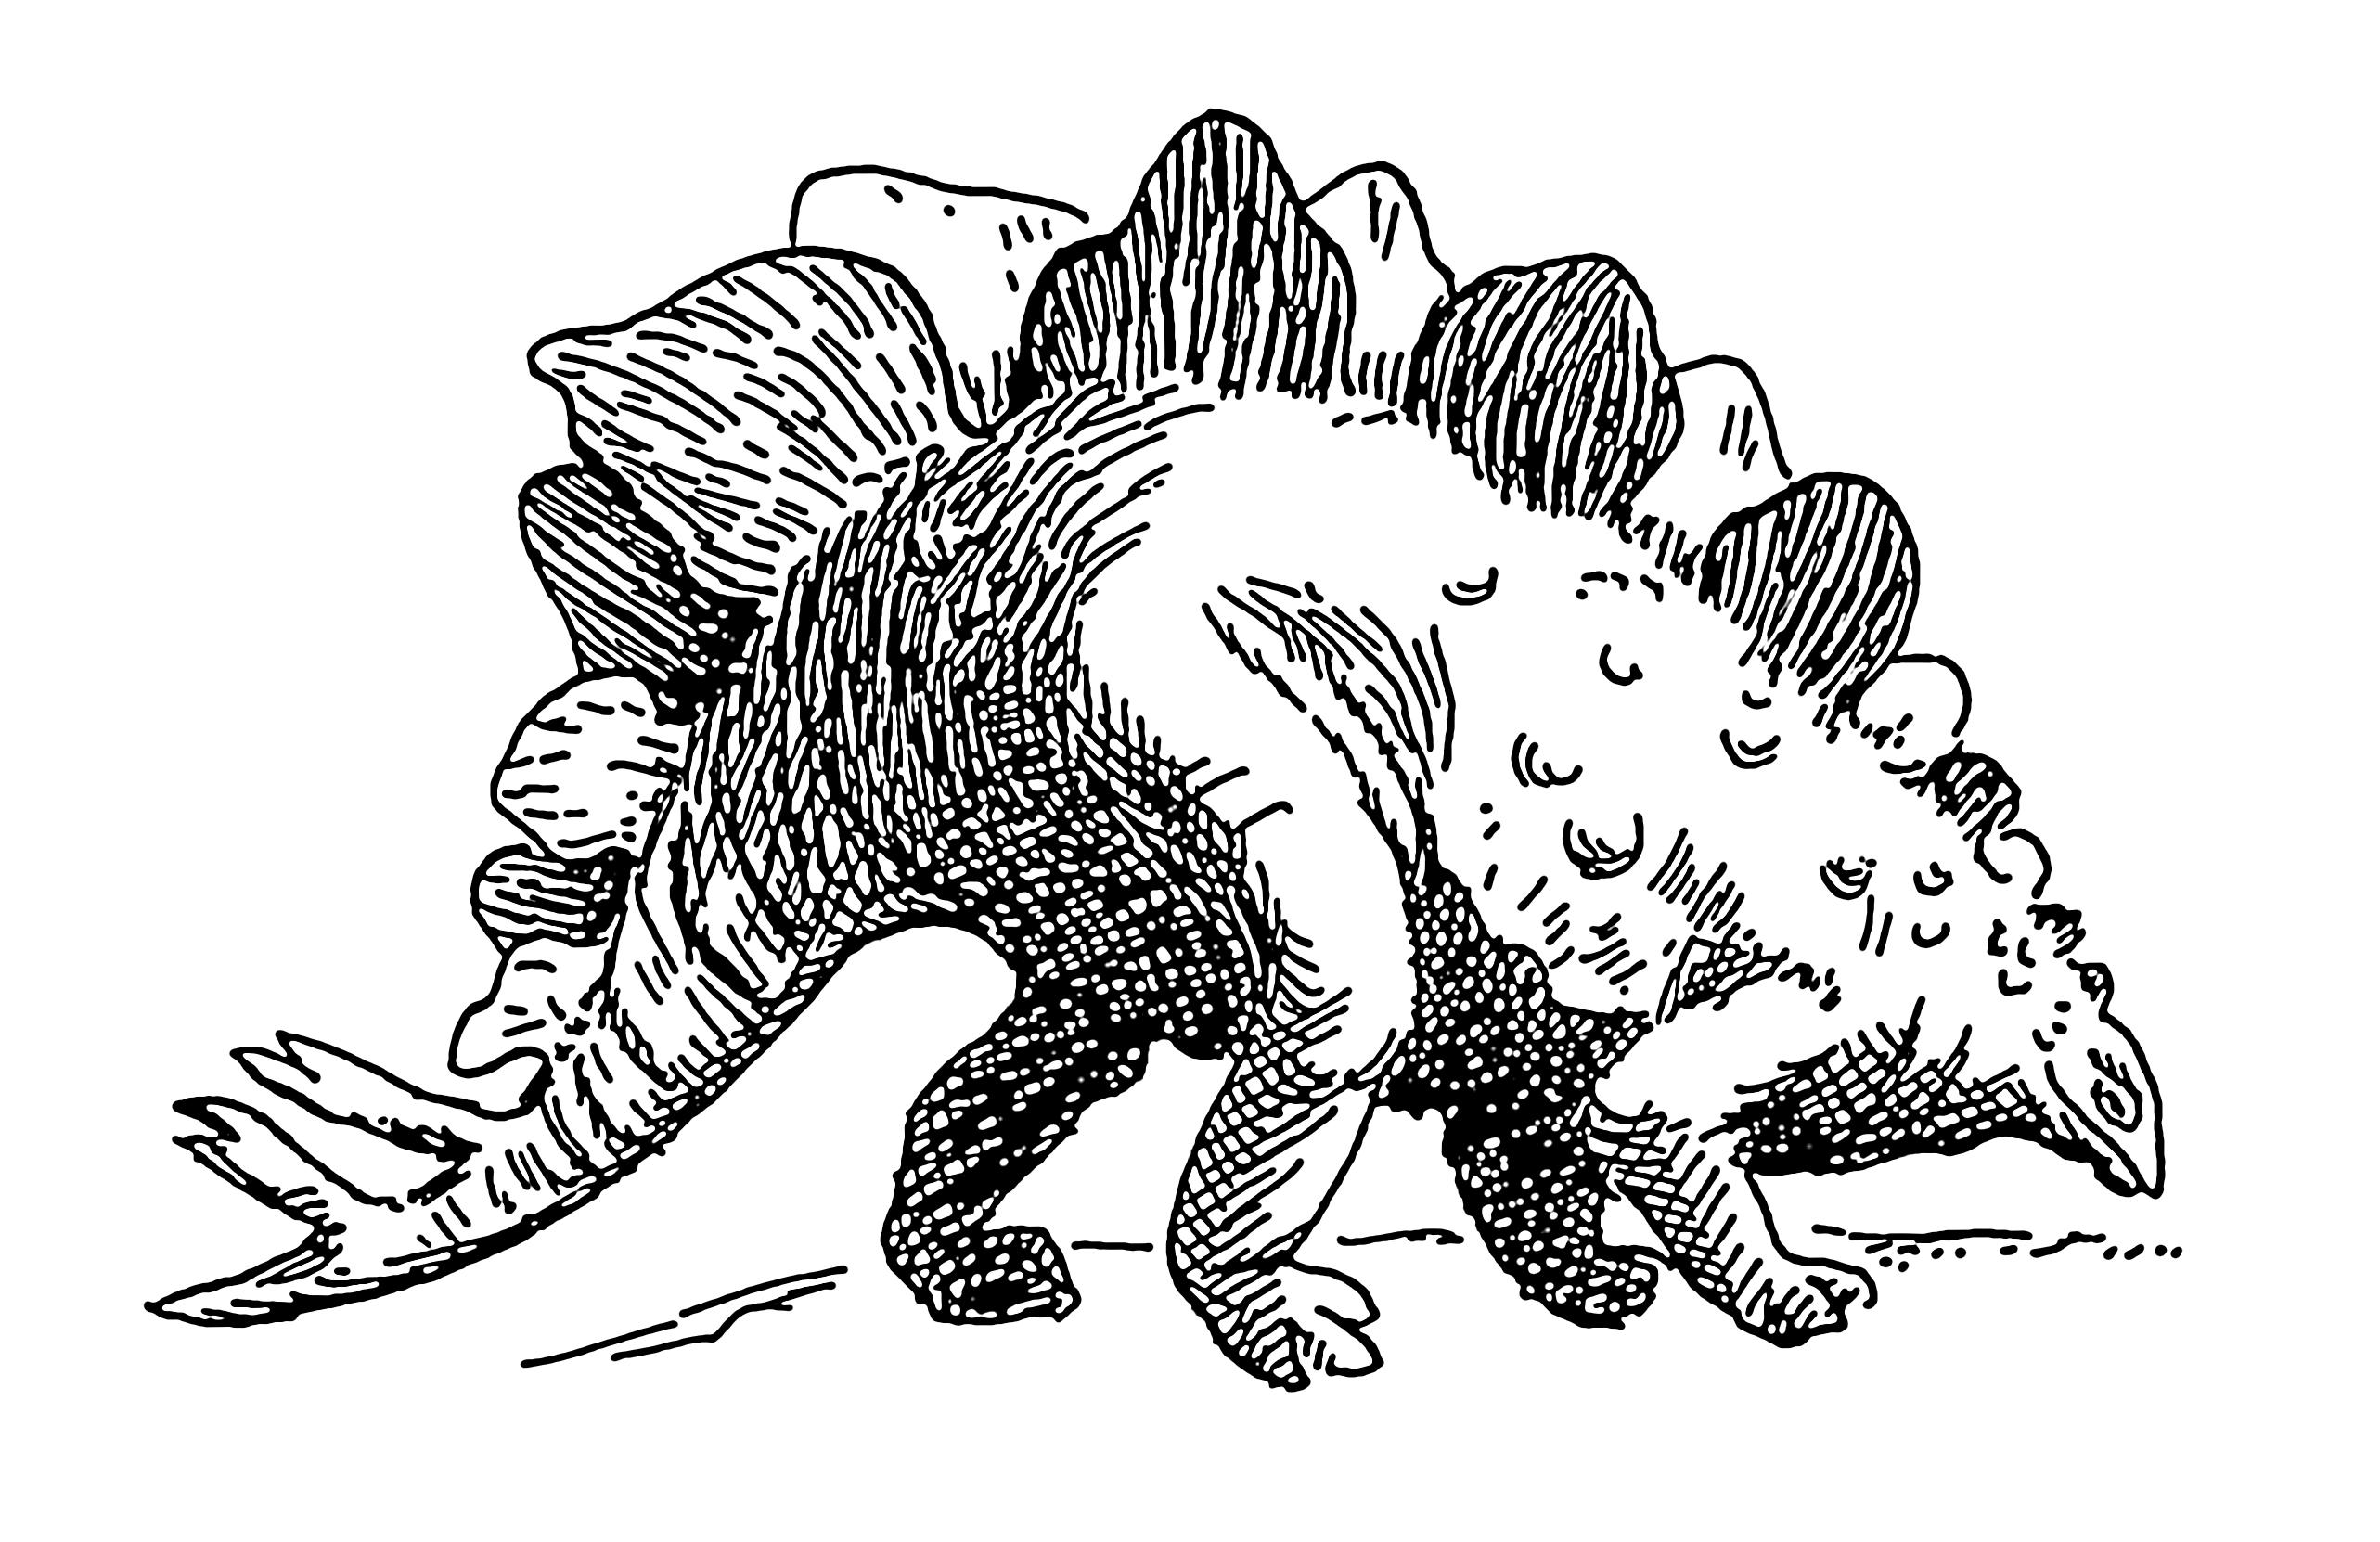 Brachiosaurus clipart dinosaur king King stegosaurus Brachiosaurus Dinosaur Gallery